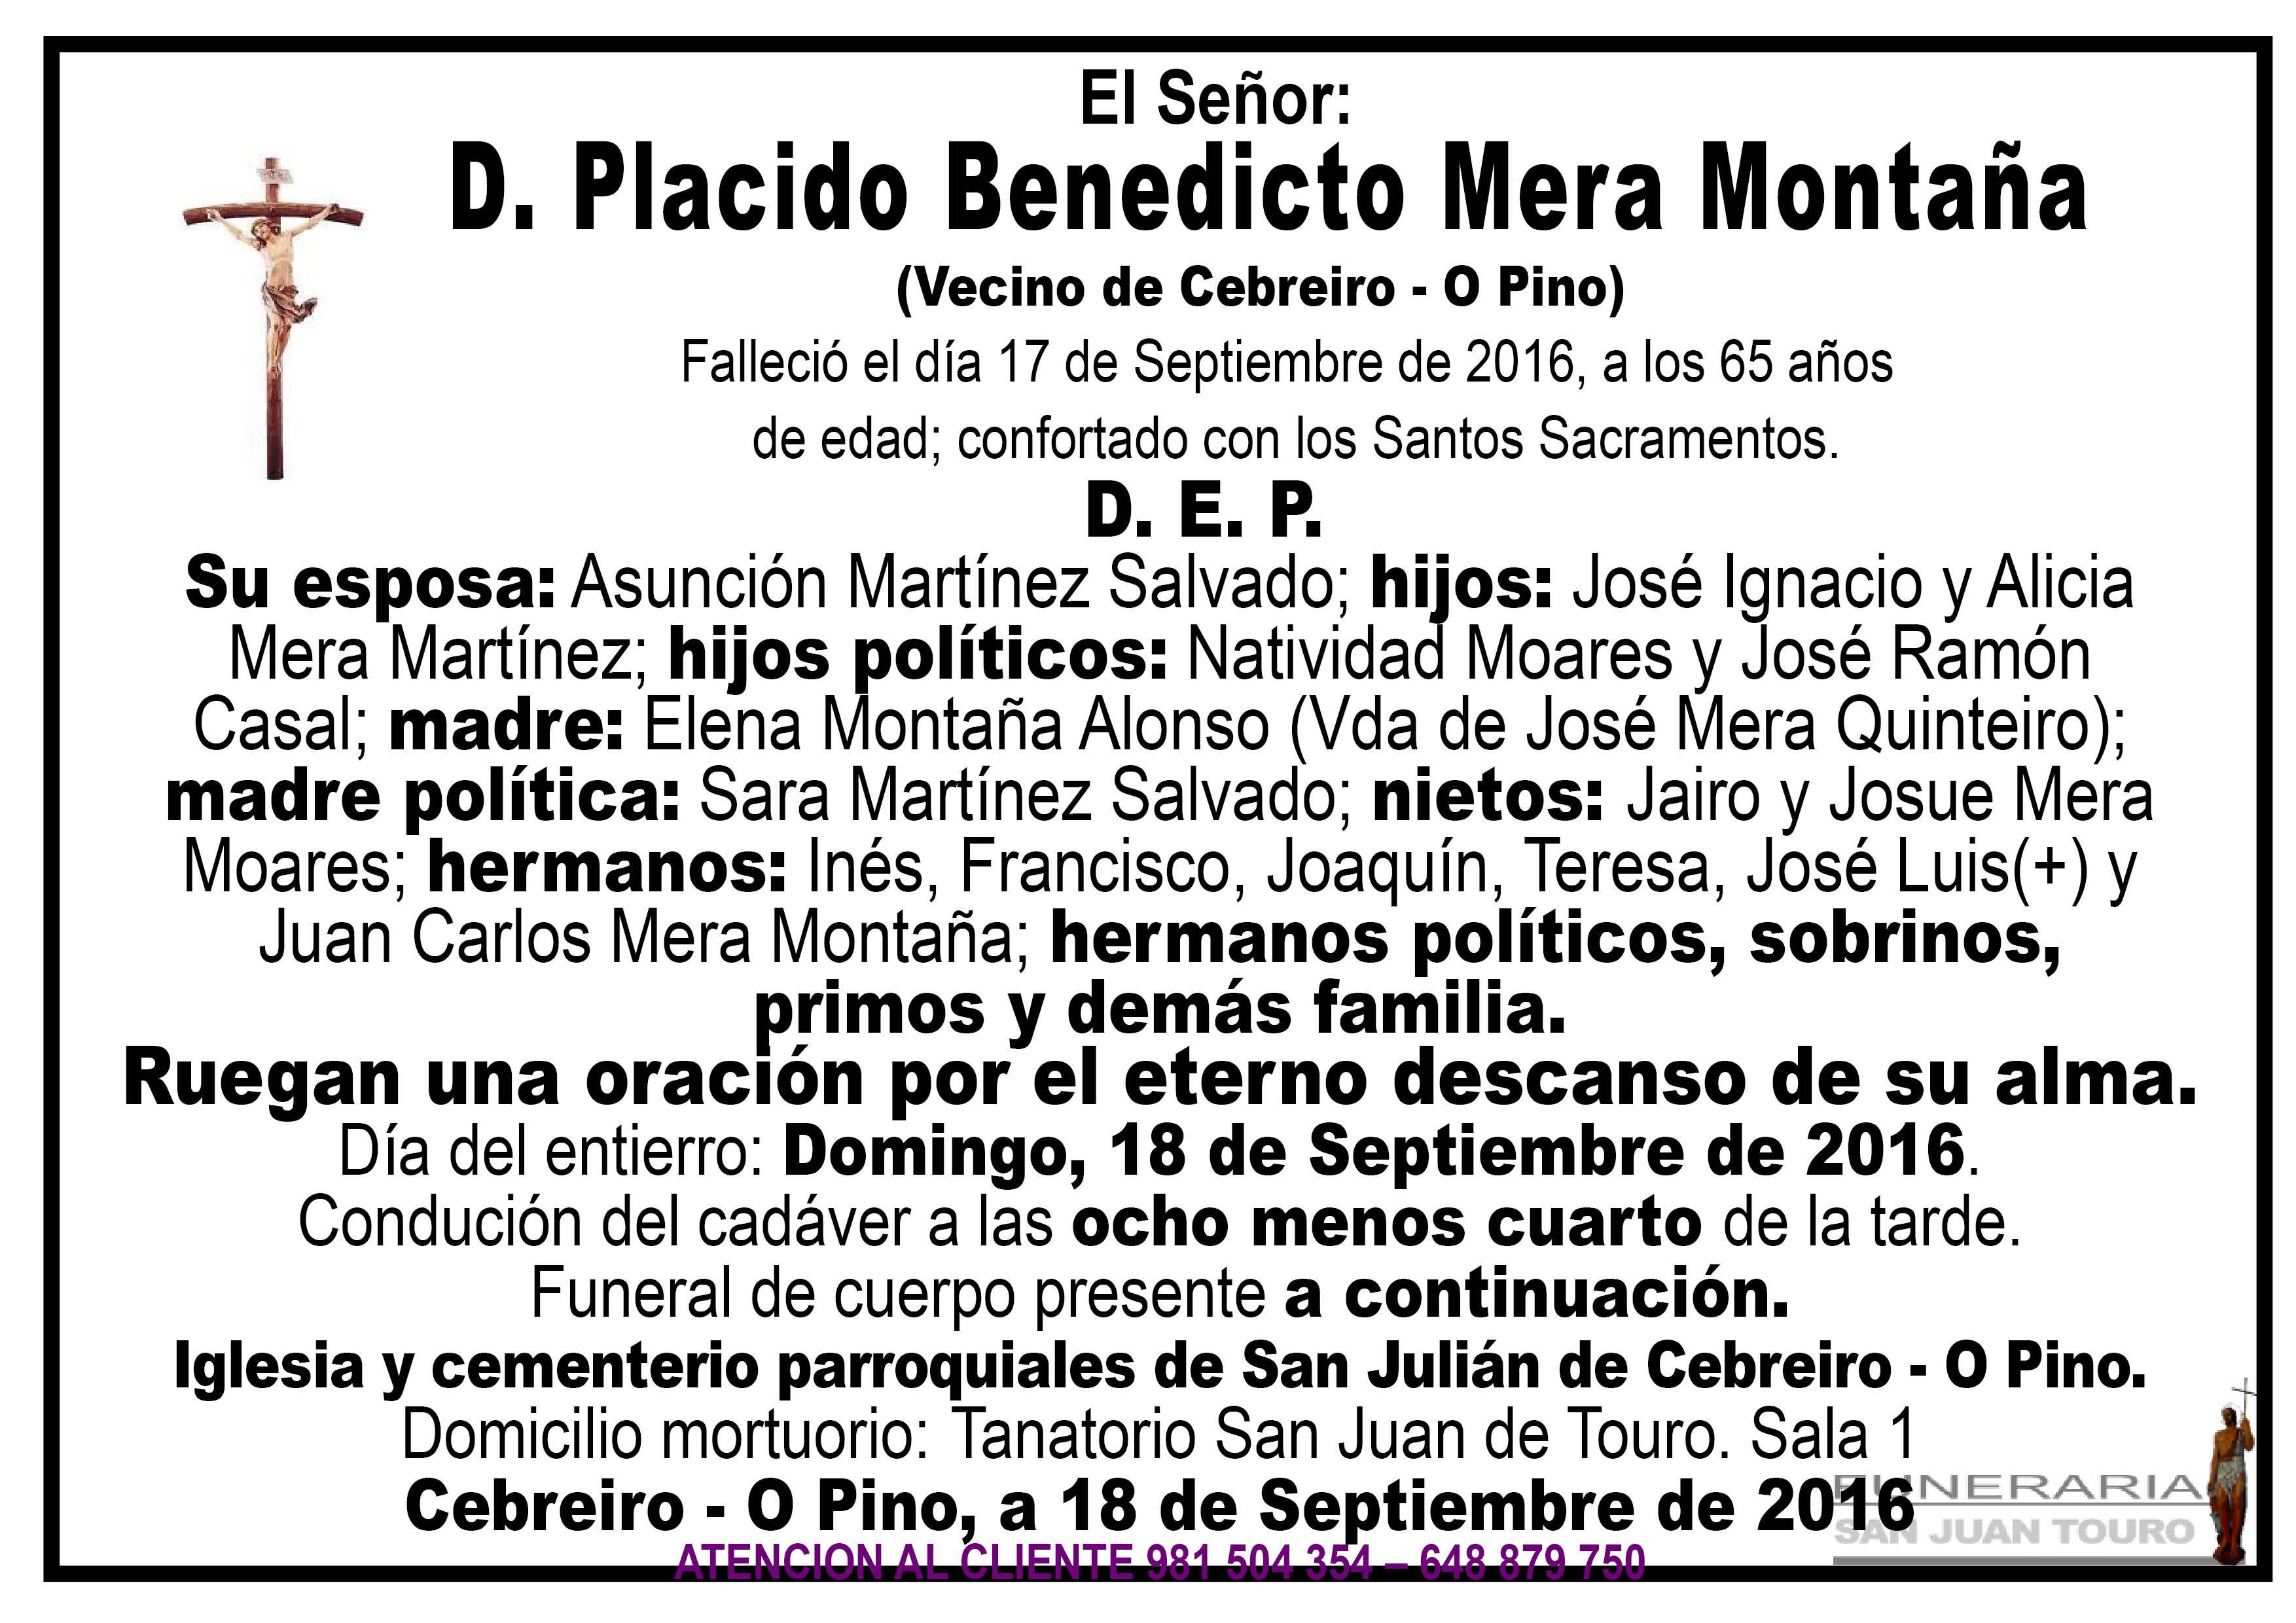 Esquela de SEPELIO D. PLACIDO BENEDICTO MERA MONTAÑA